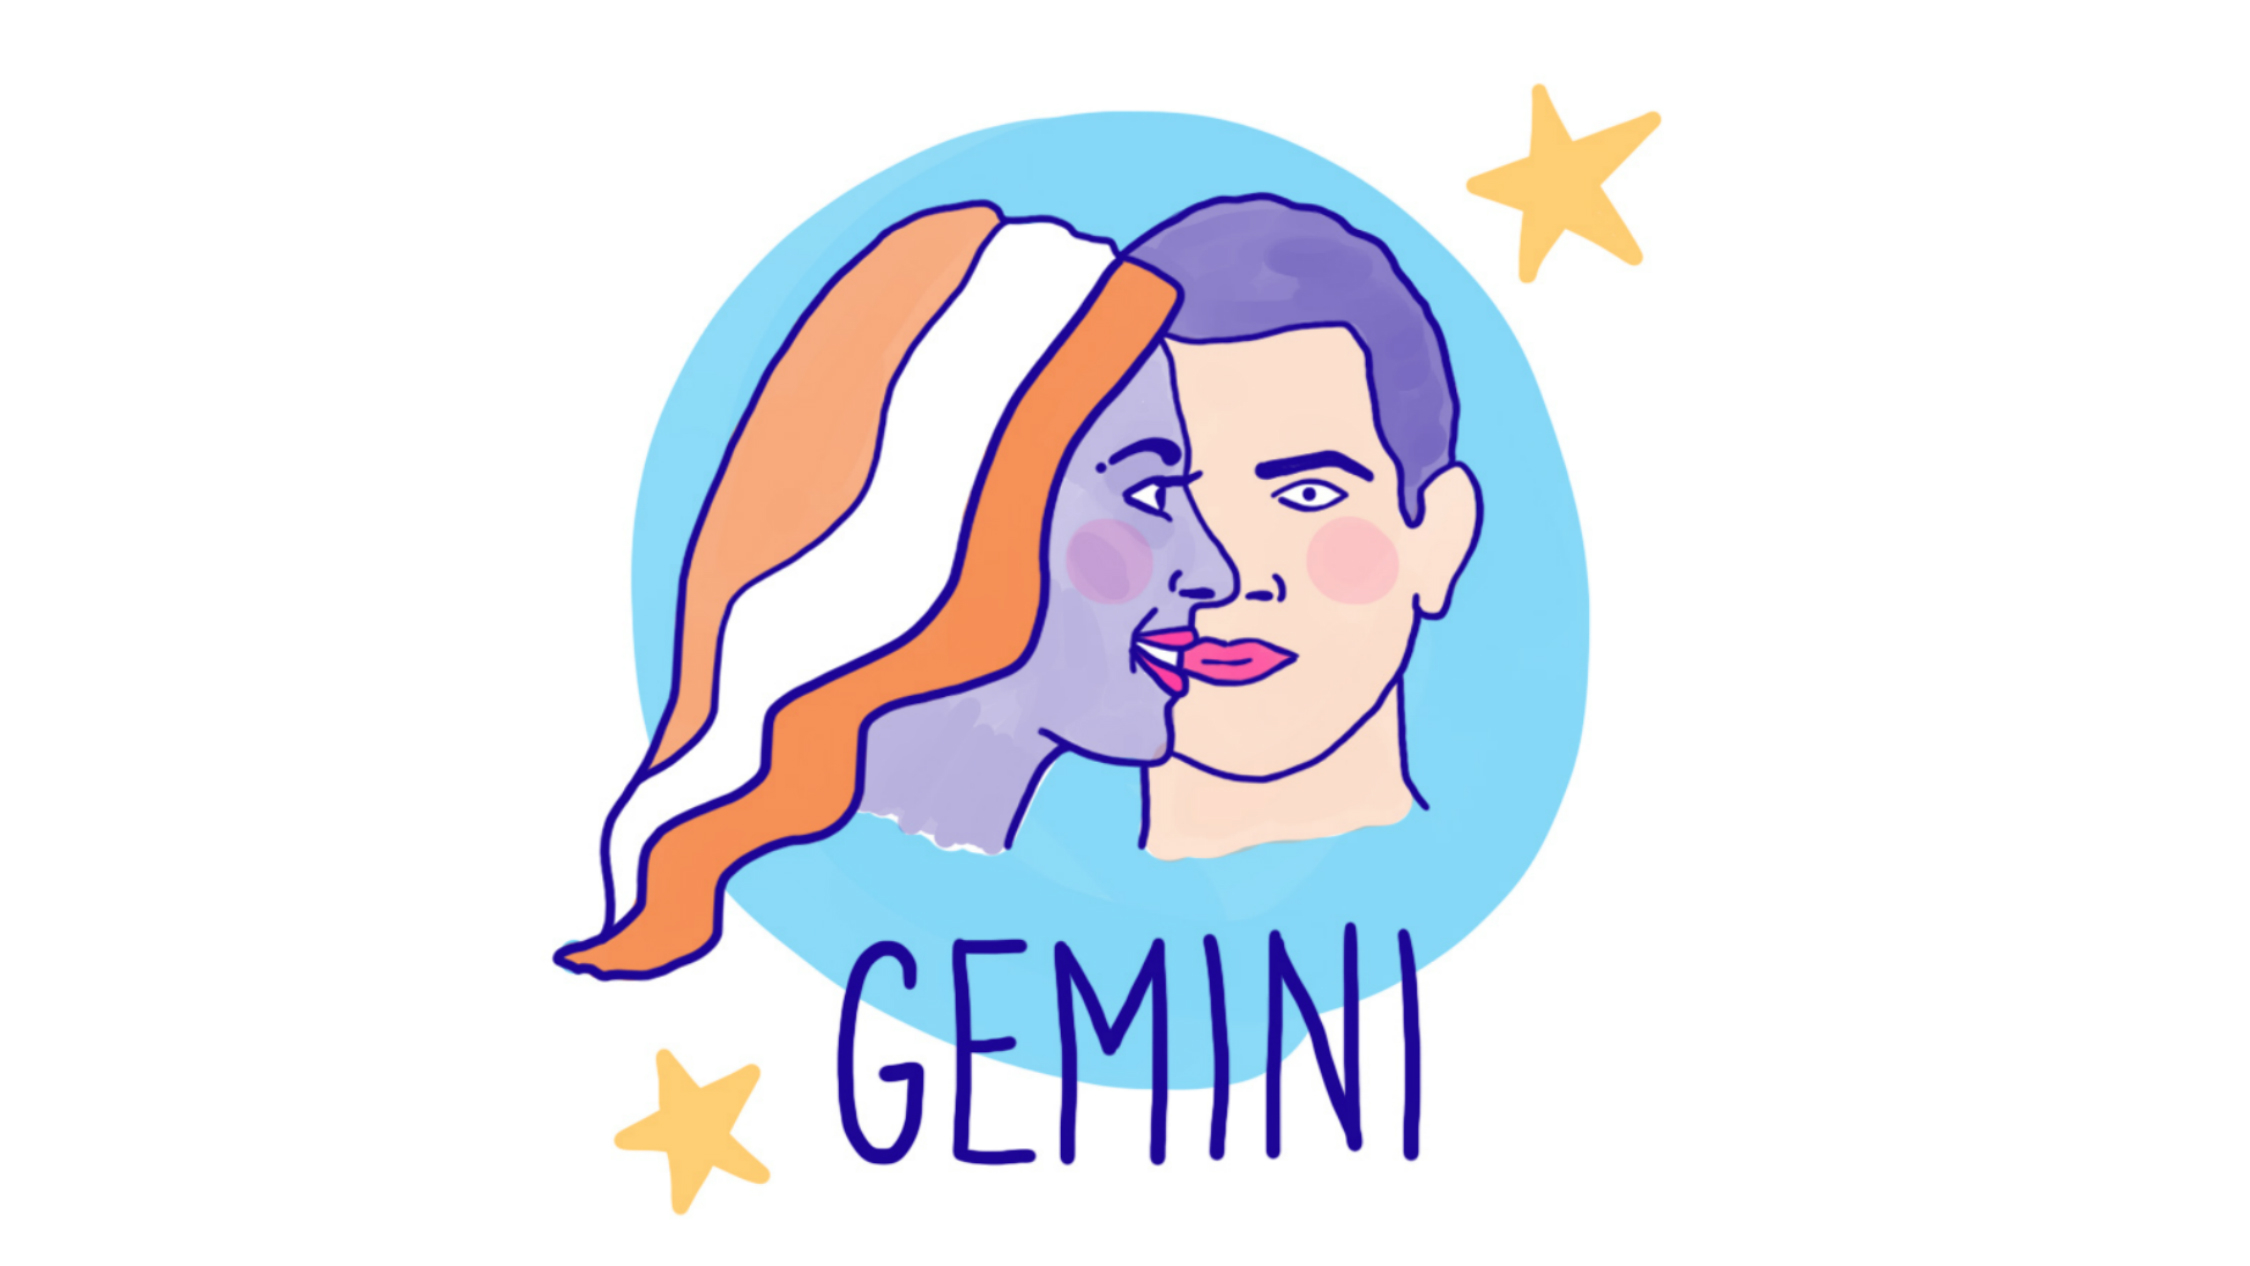 Gemini astrological illustration